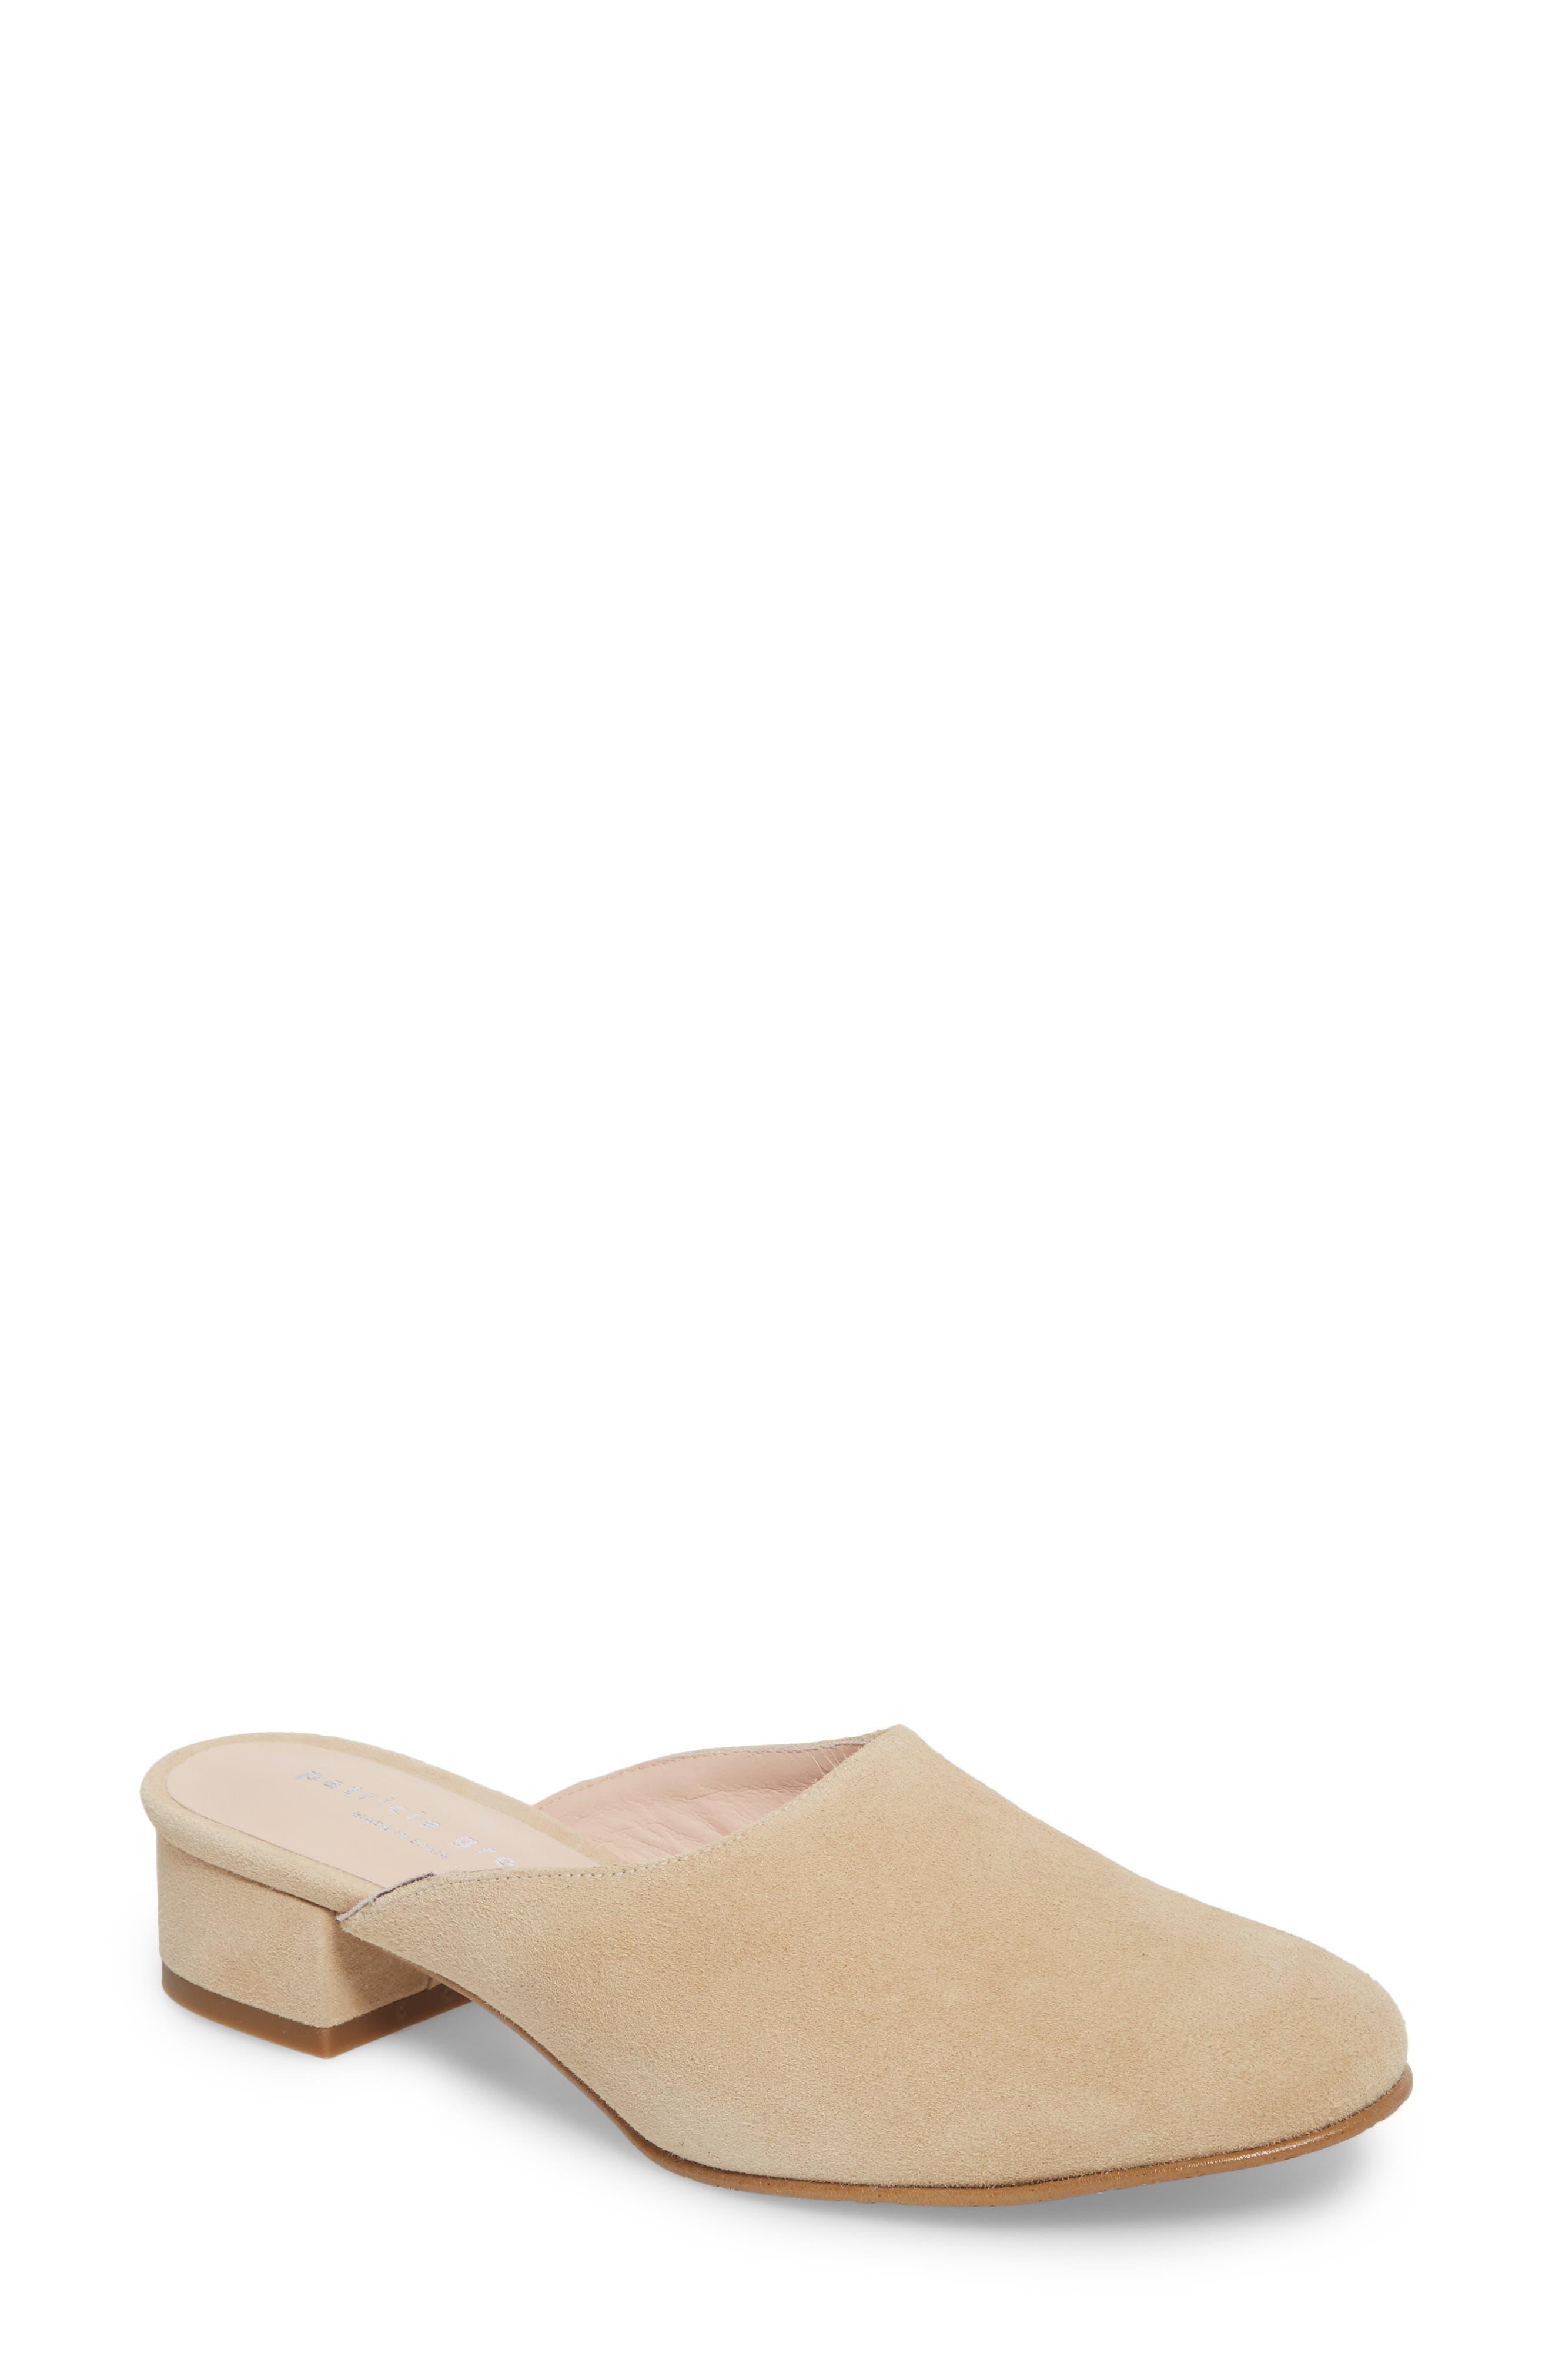 patricia green Ava Block Heel Mule (Women)